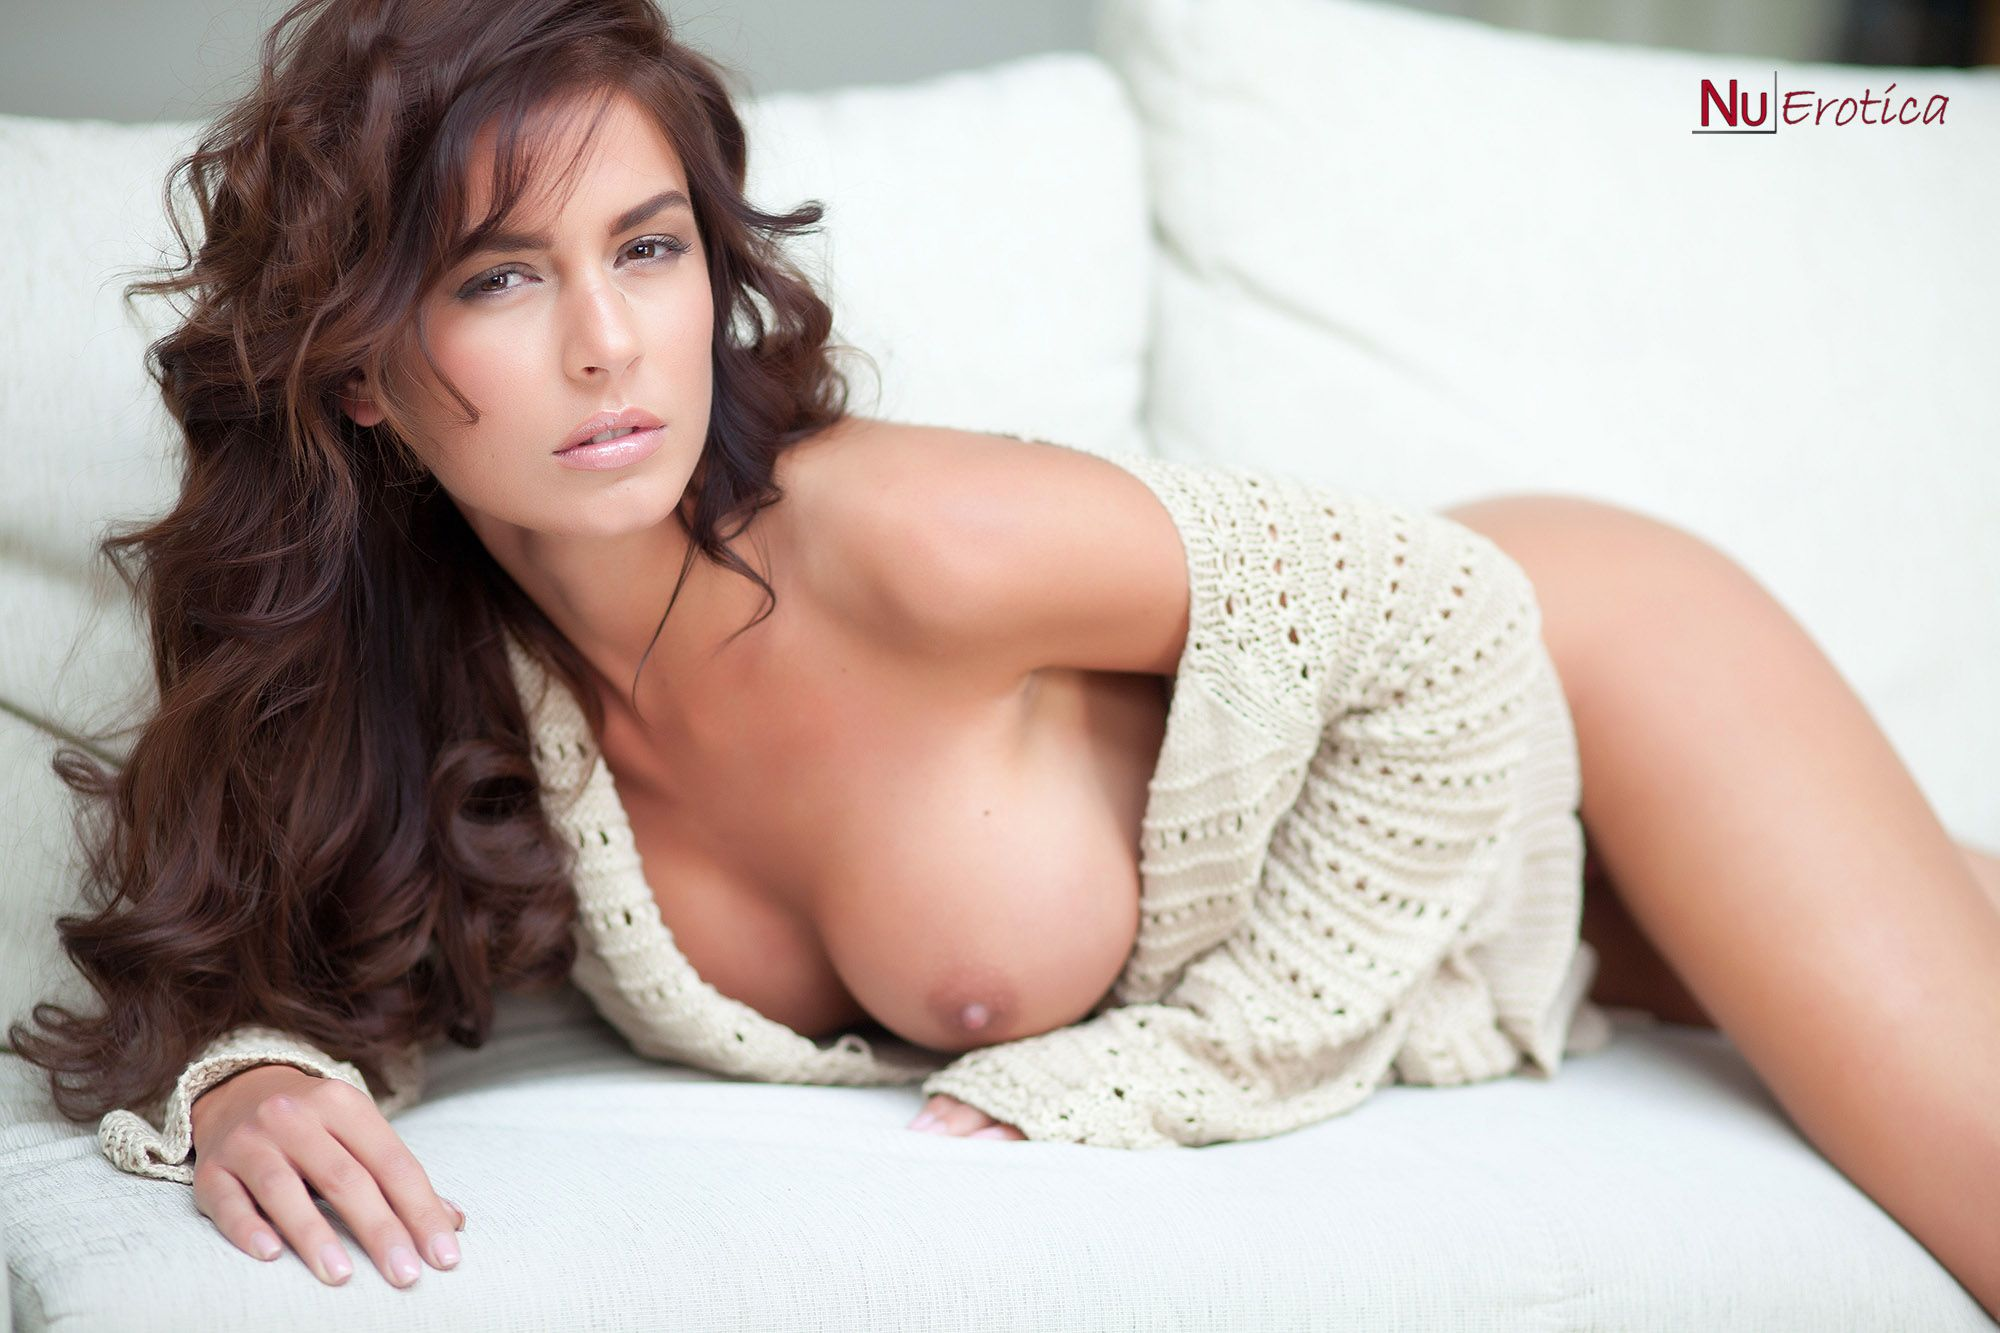 Alexa Varga At Nuerotica Babes And Glamour Models